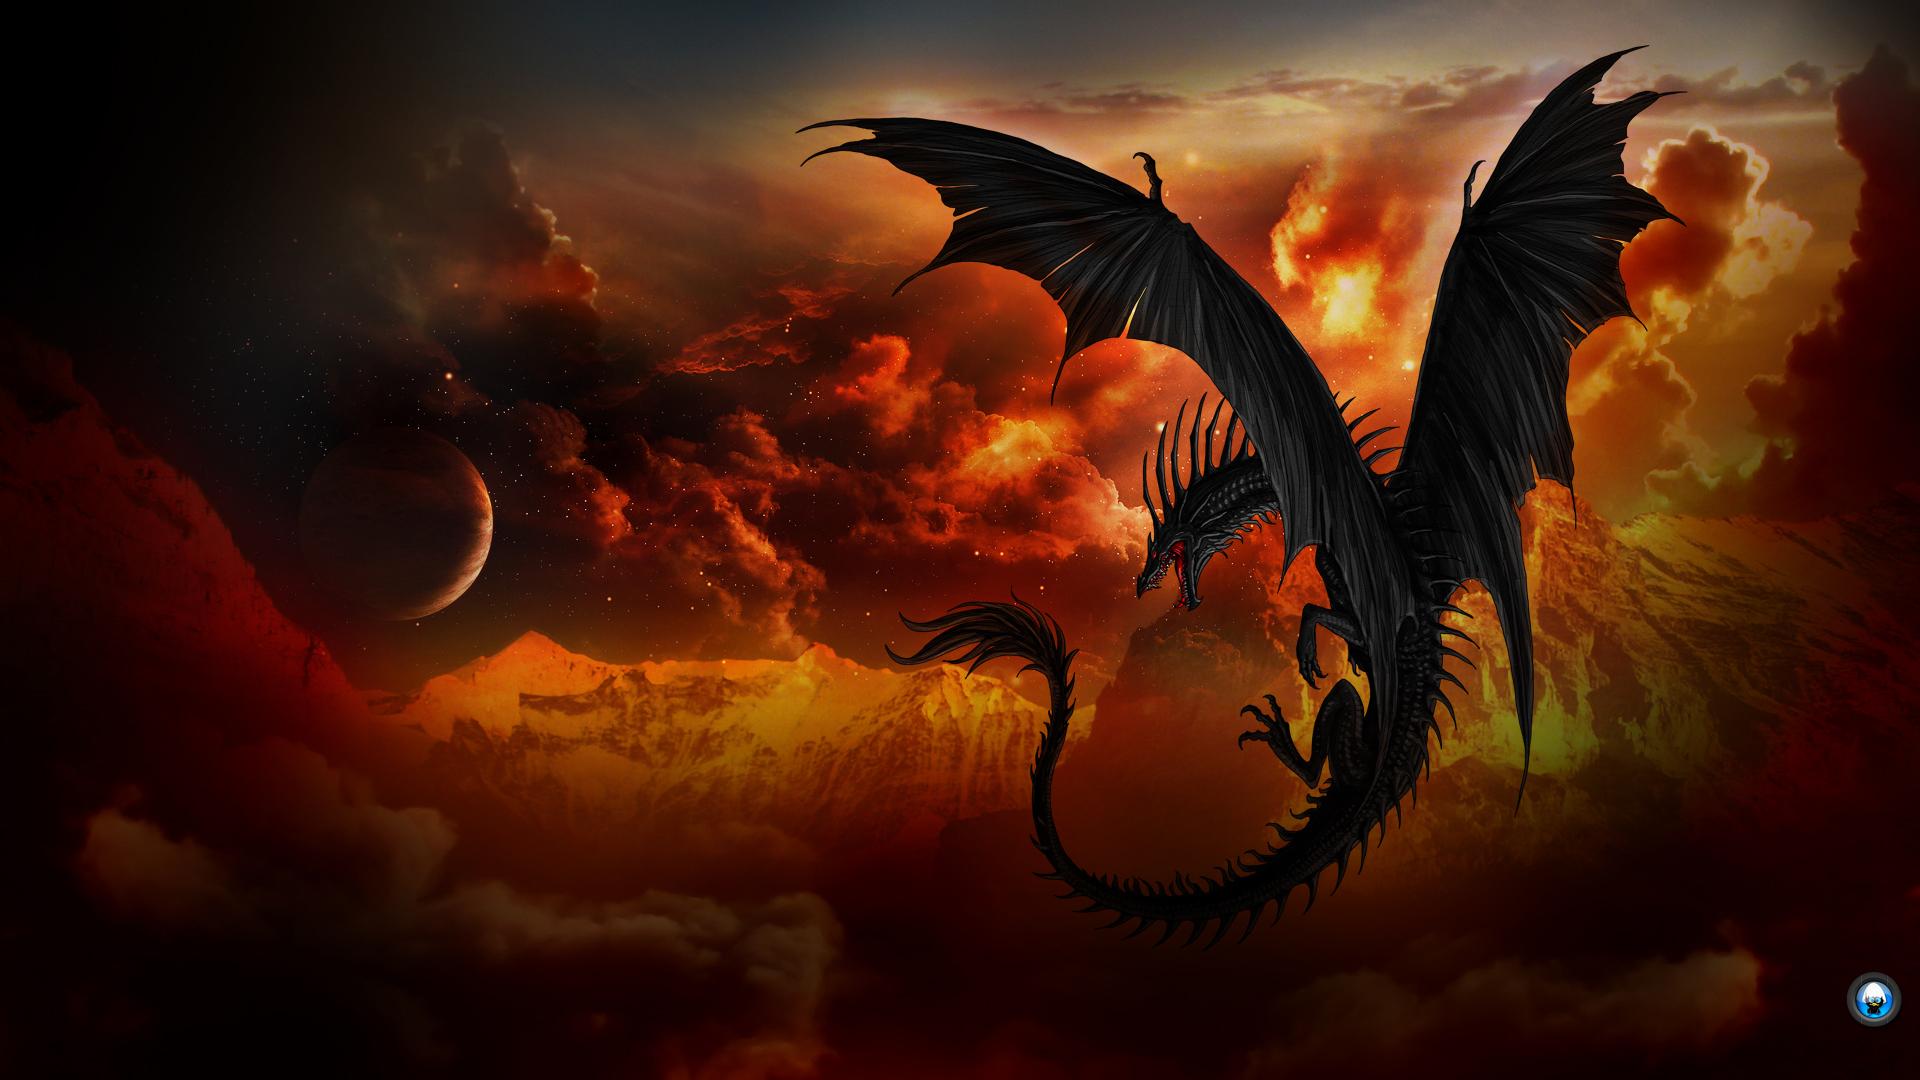 Dragon Computer Wallpapers Desktop Backgrounds